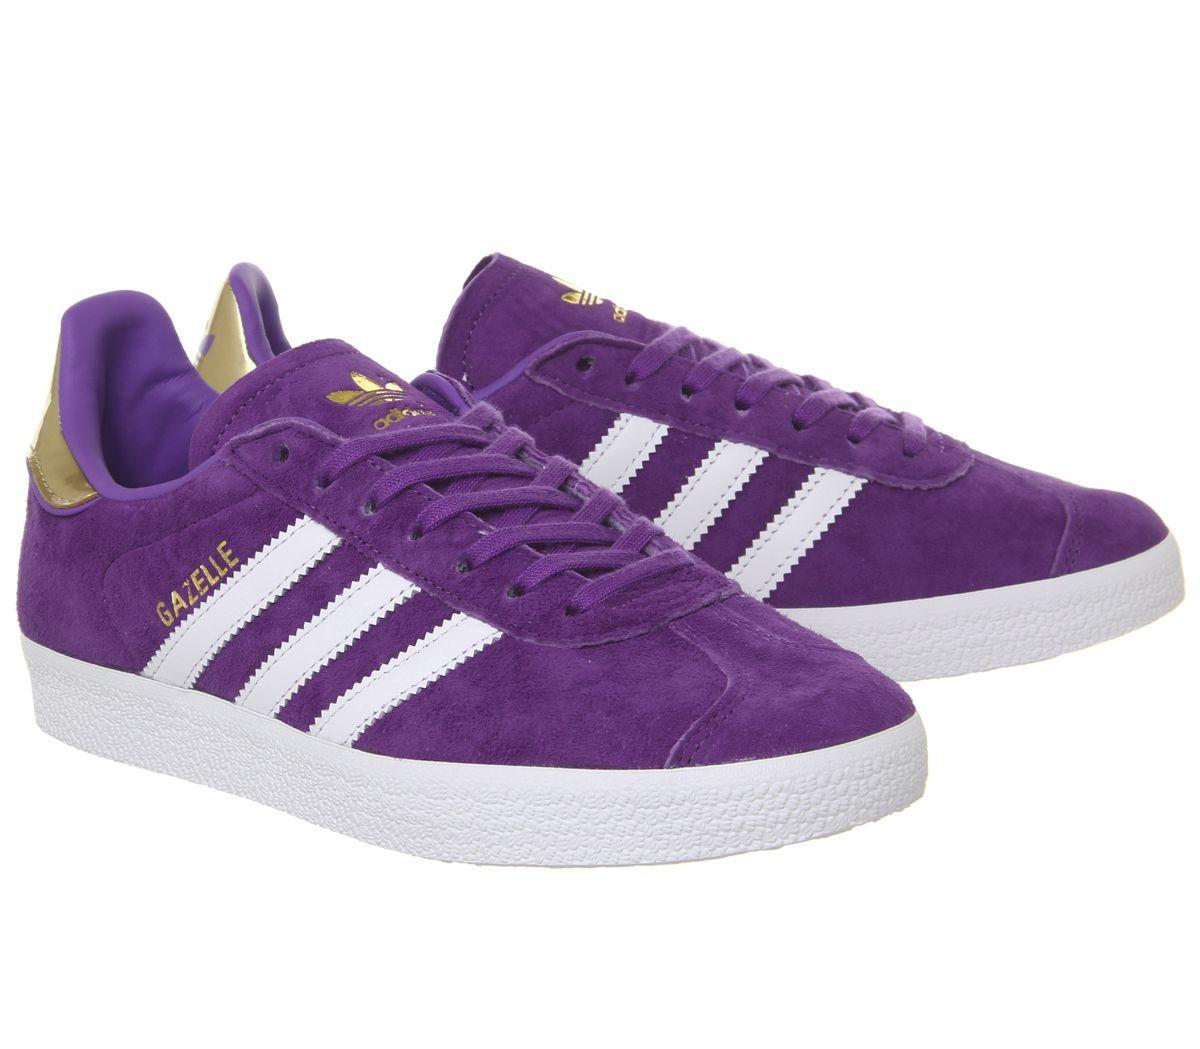 adidas Gazelle Trainers White Purple